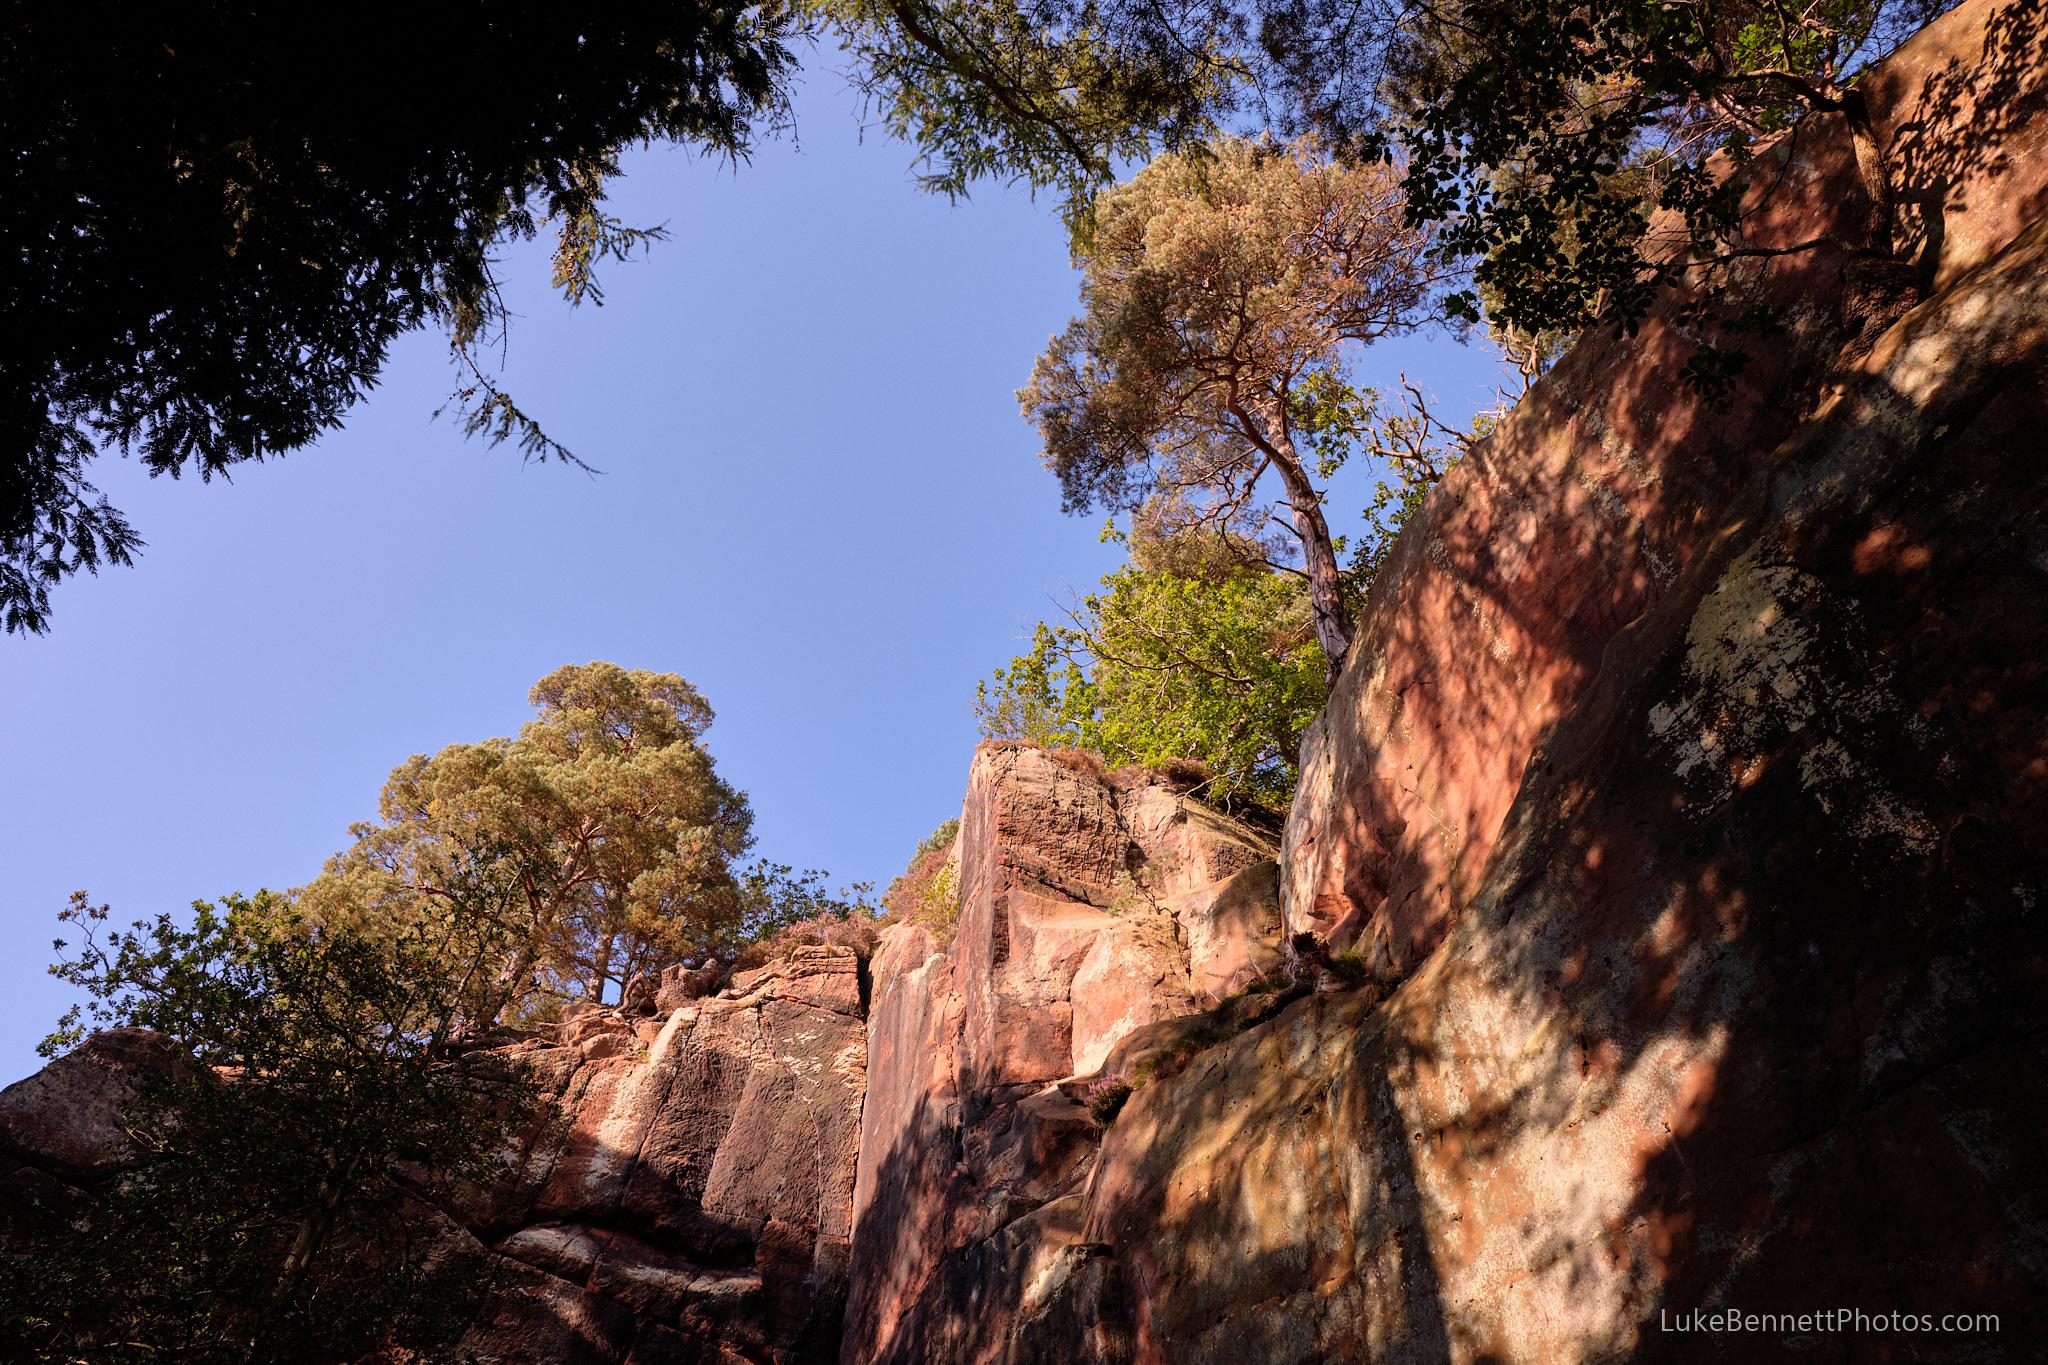 Nesscliffe Hills